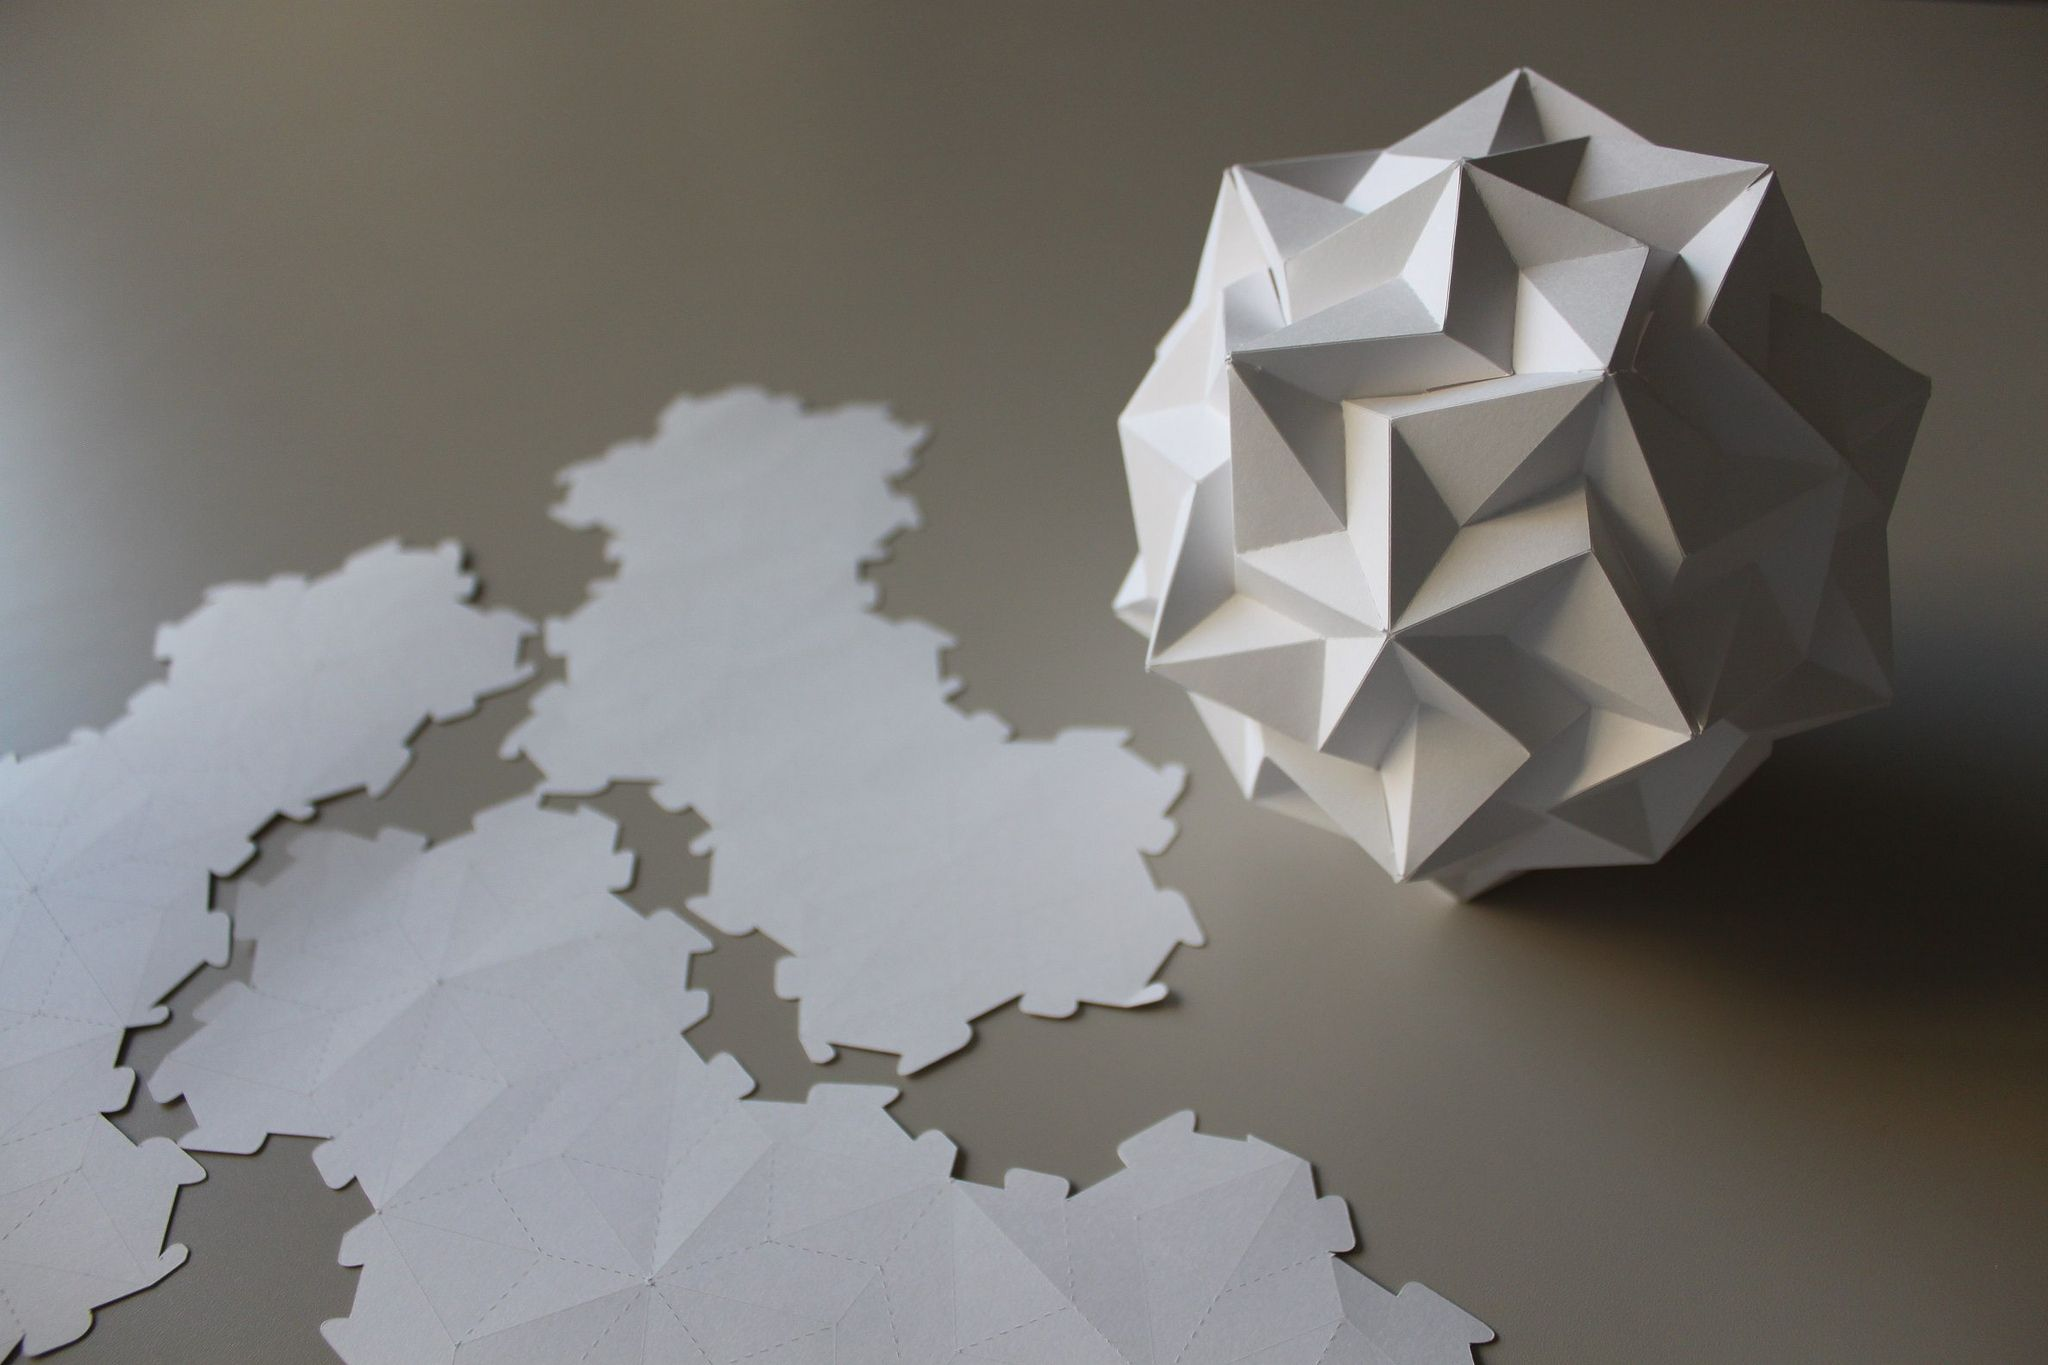 Dodecahedron Paradigma | Origami, Paper folding and Kirigami - photo#50